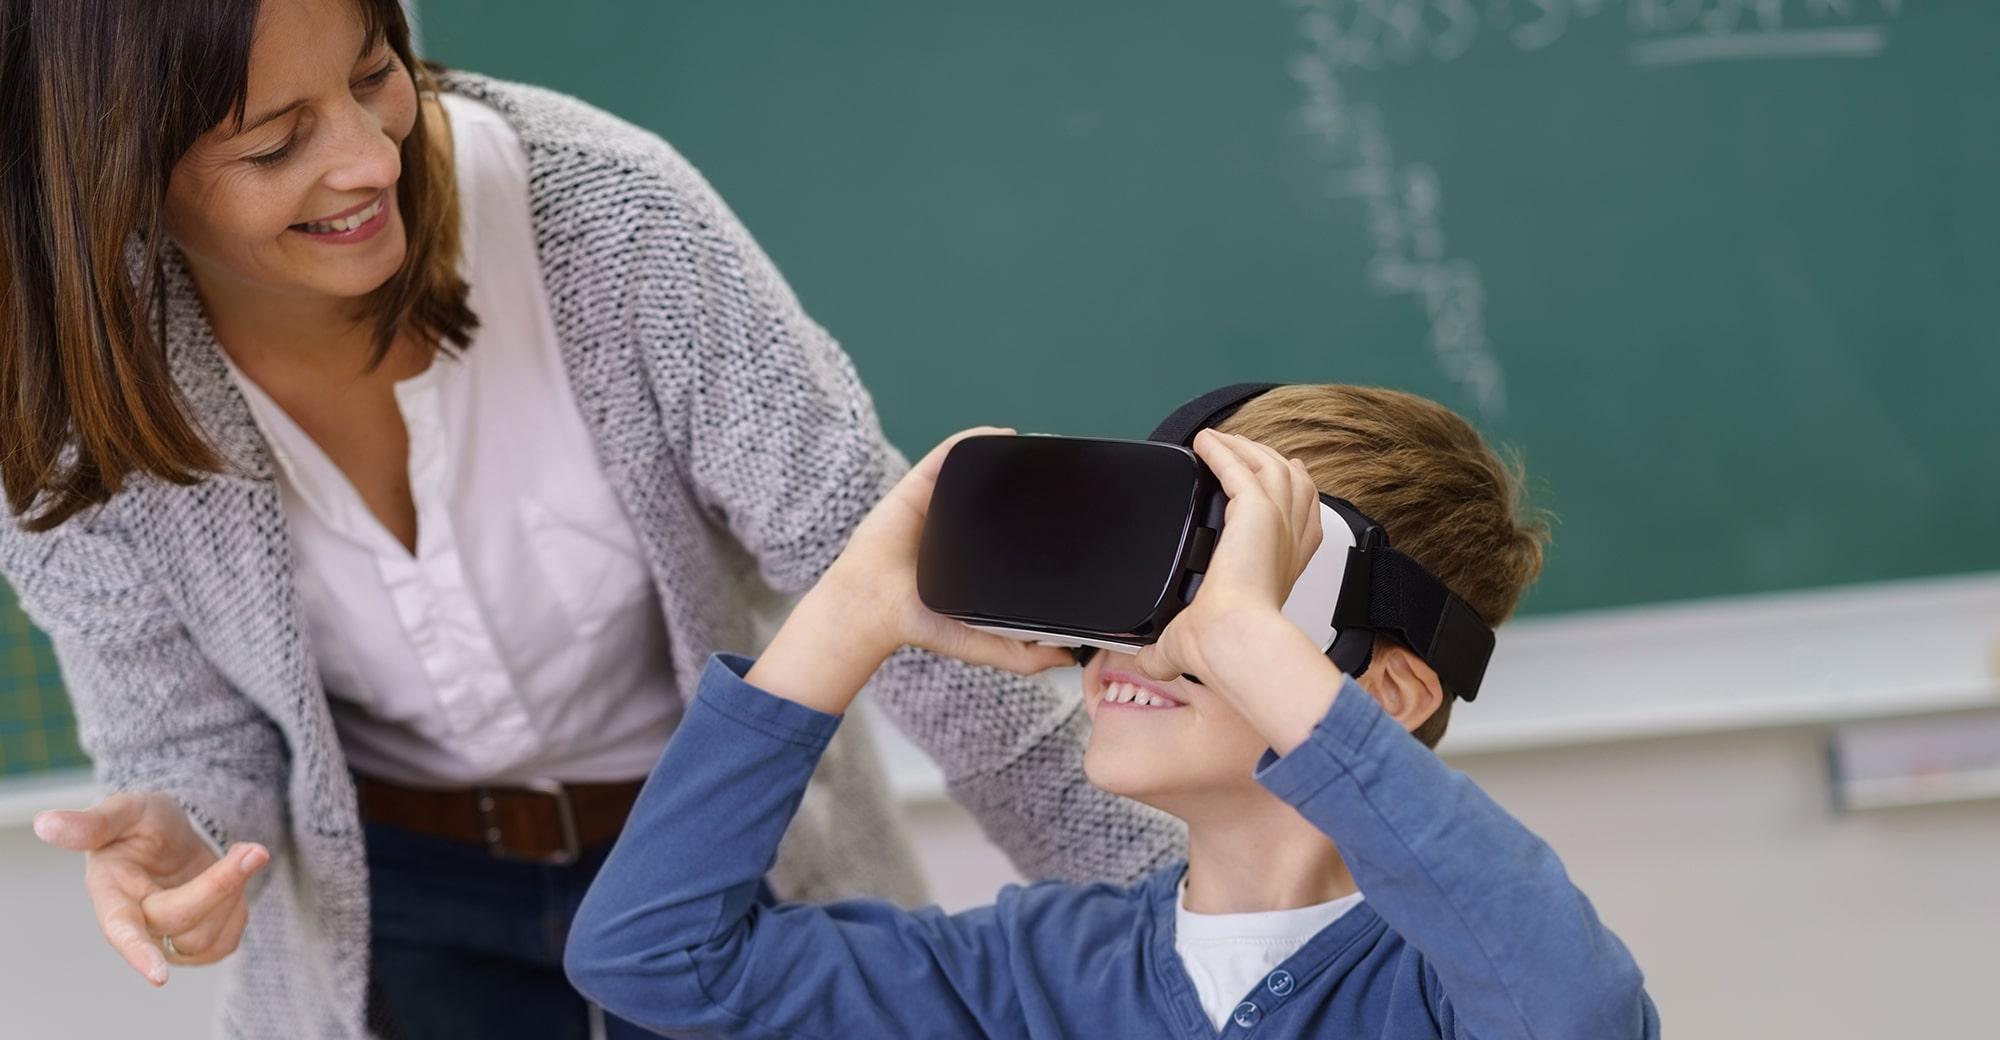 Kind mit VR Brille, Foto: contrastwerkstatt – stock.adobe.com